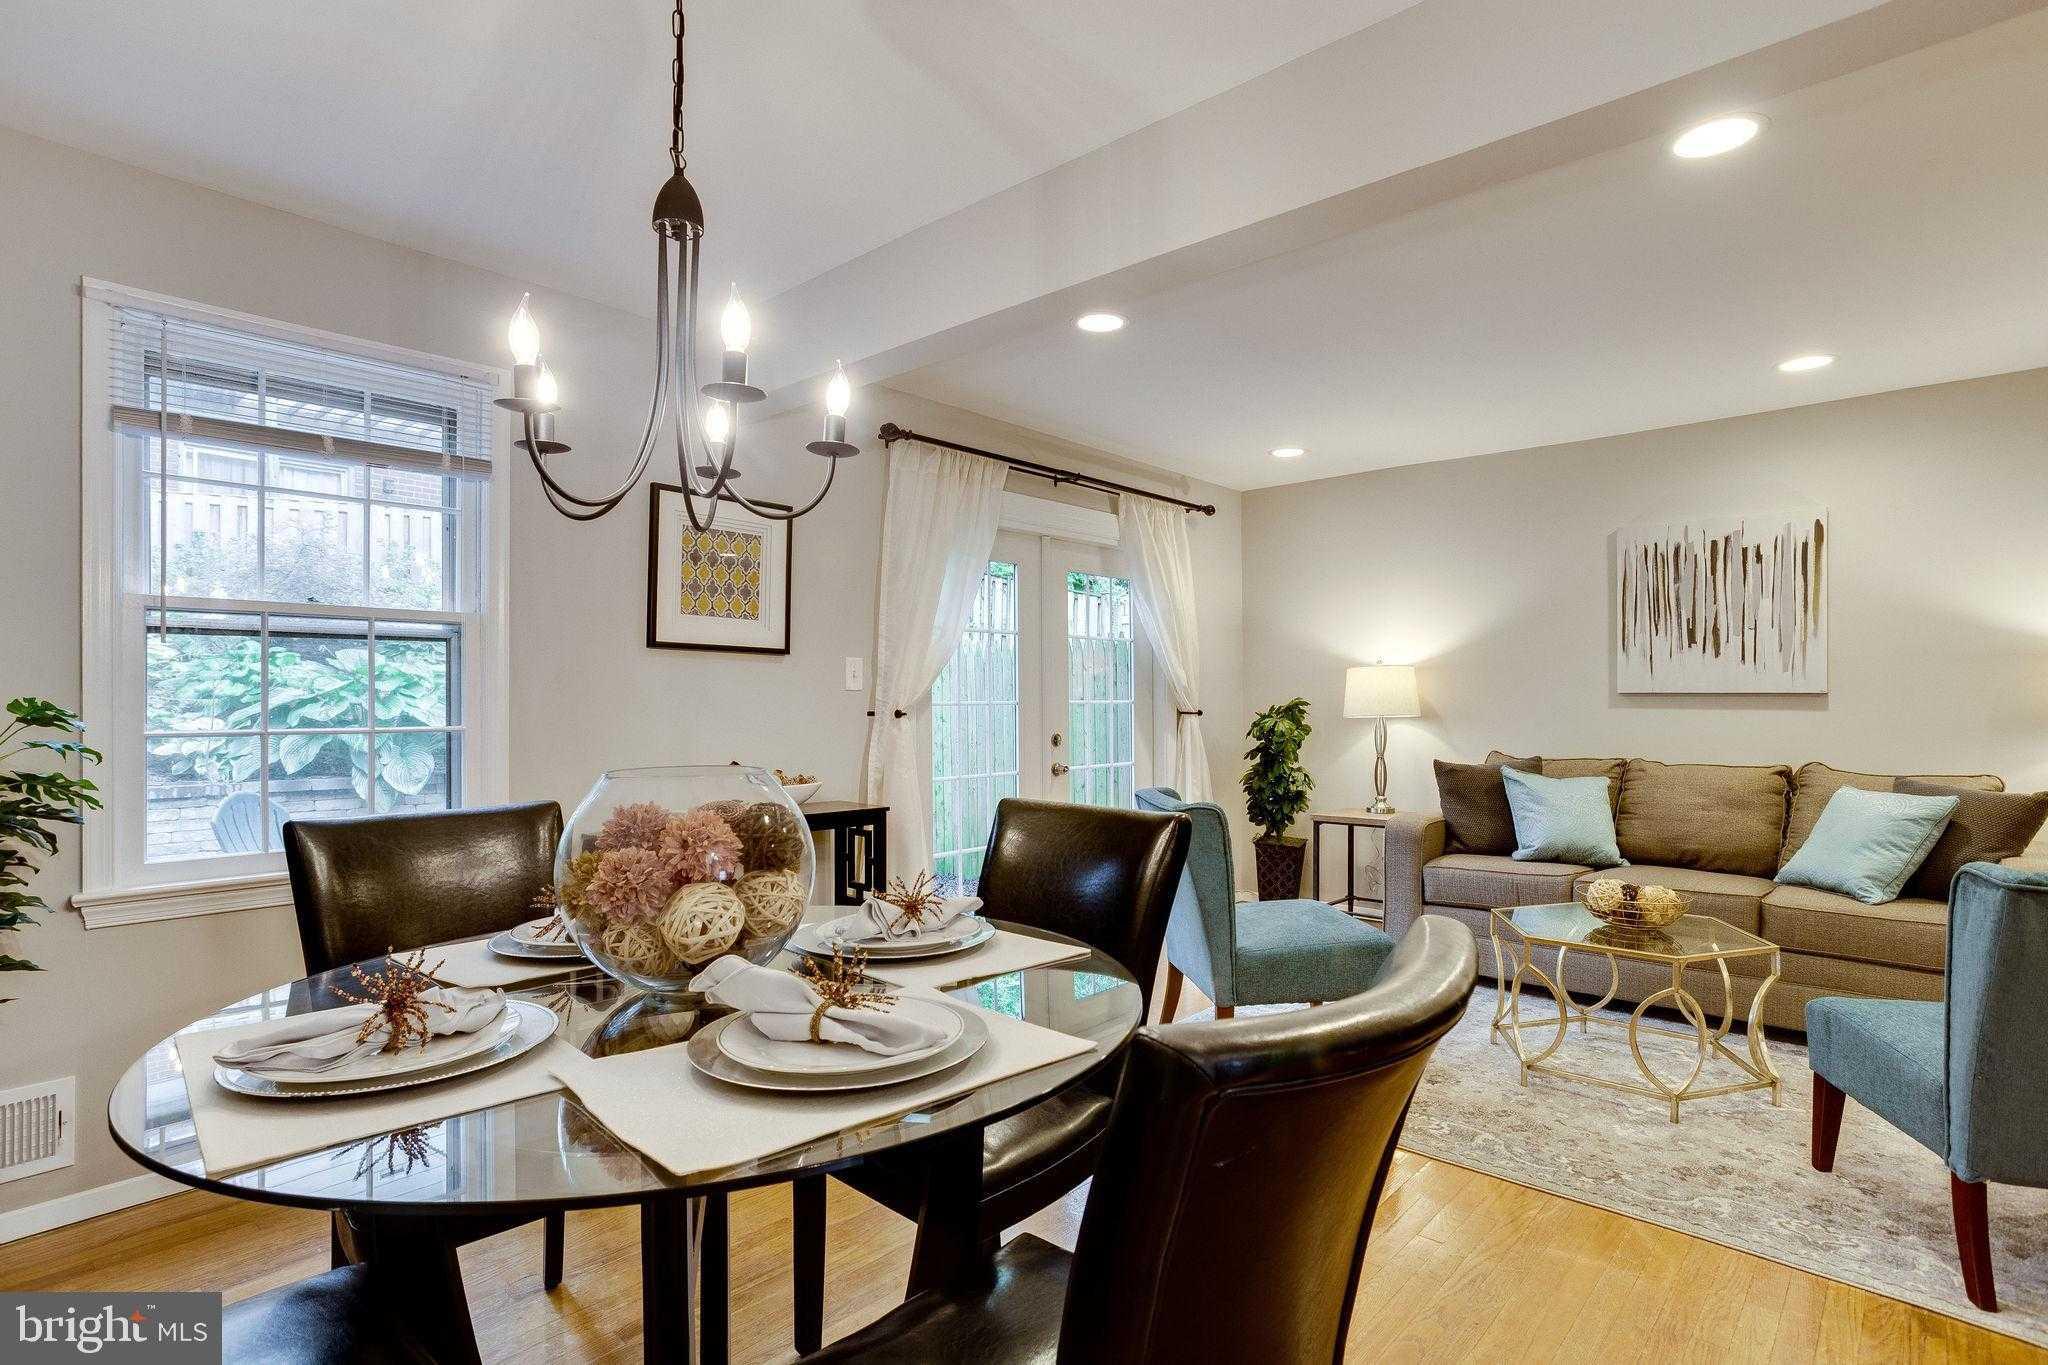 $485,000 - 3Br/3Ba -  for Sale in Rock Creek Palisades, Kensington